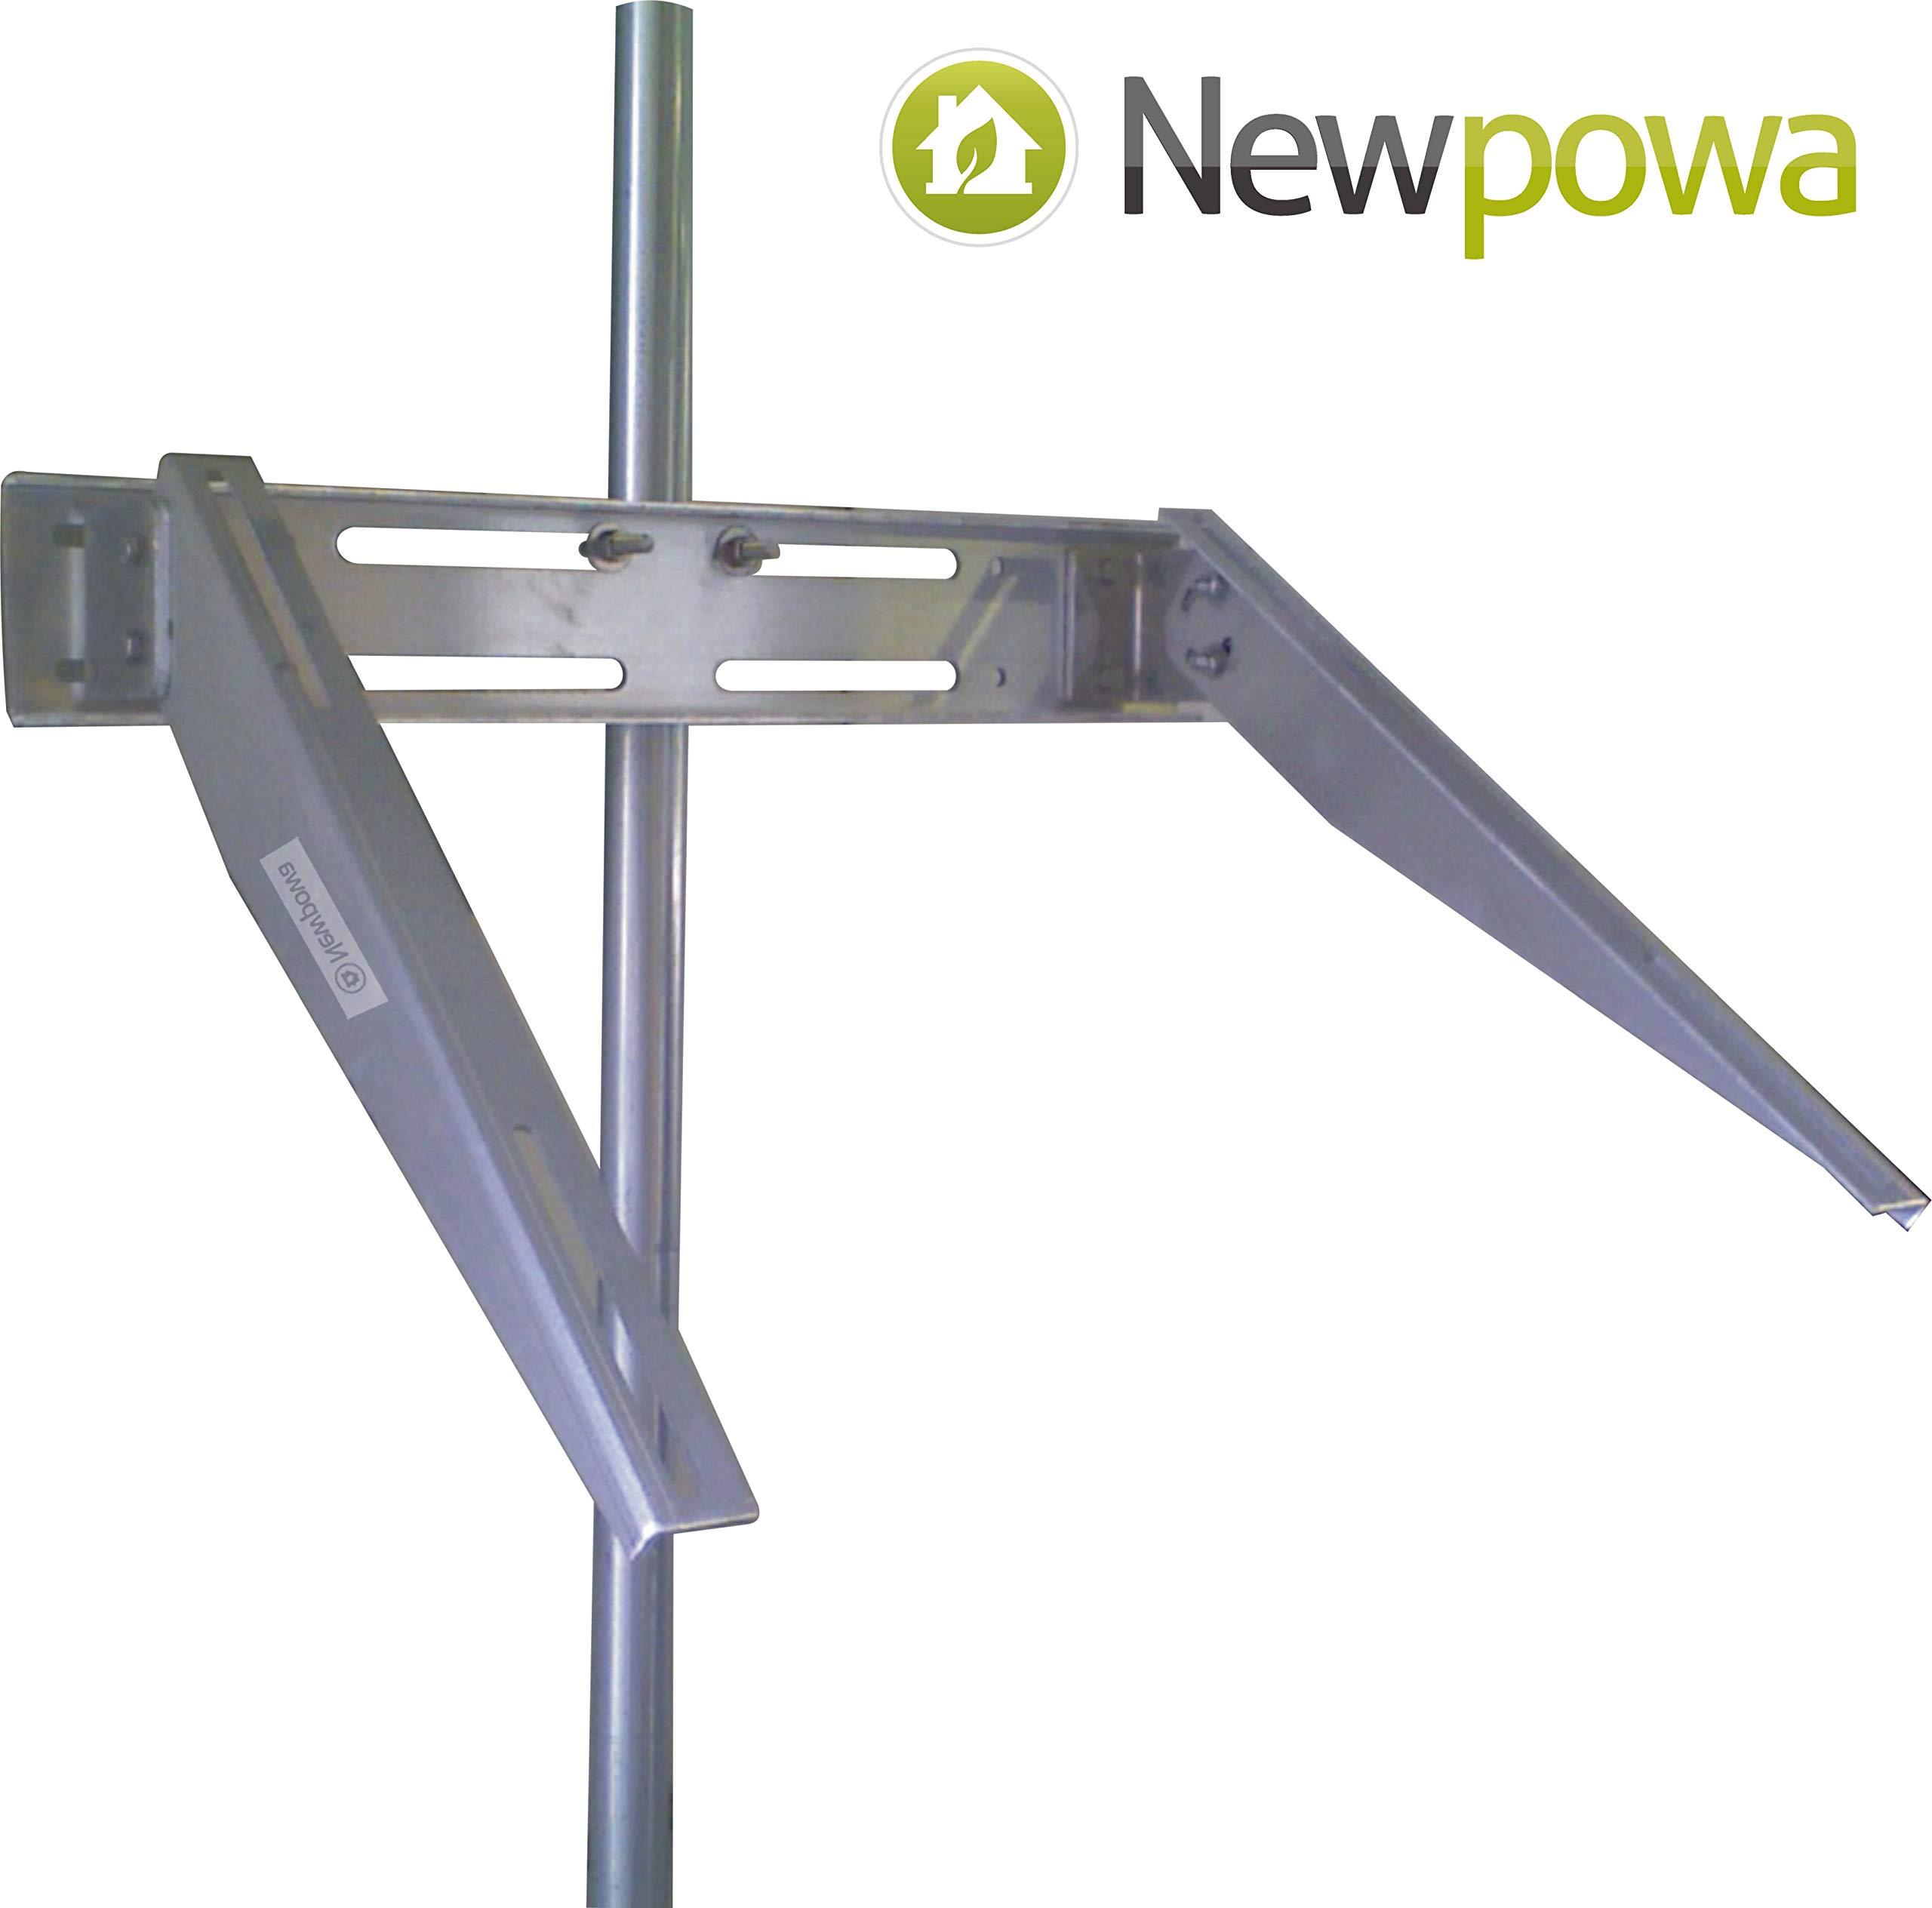 Newpowa Universal Solar Panel Heavy Duty Double Arm Pole Wall Mount